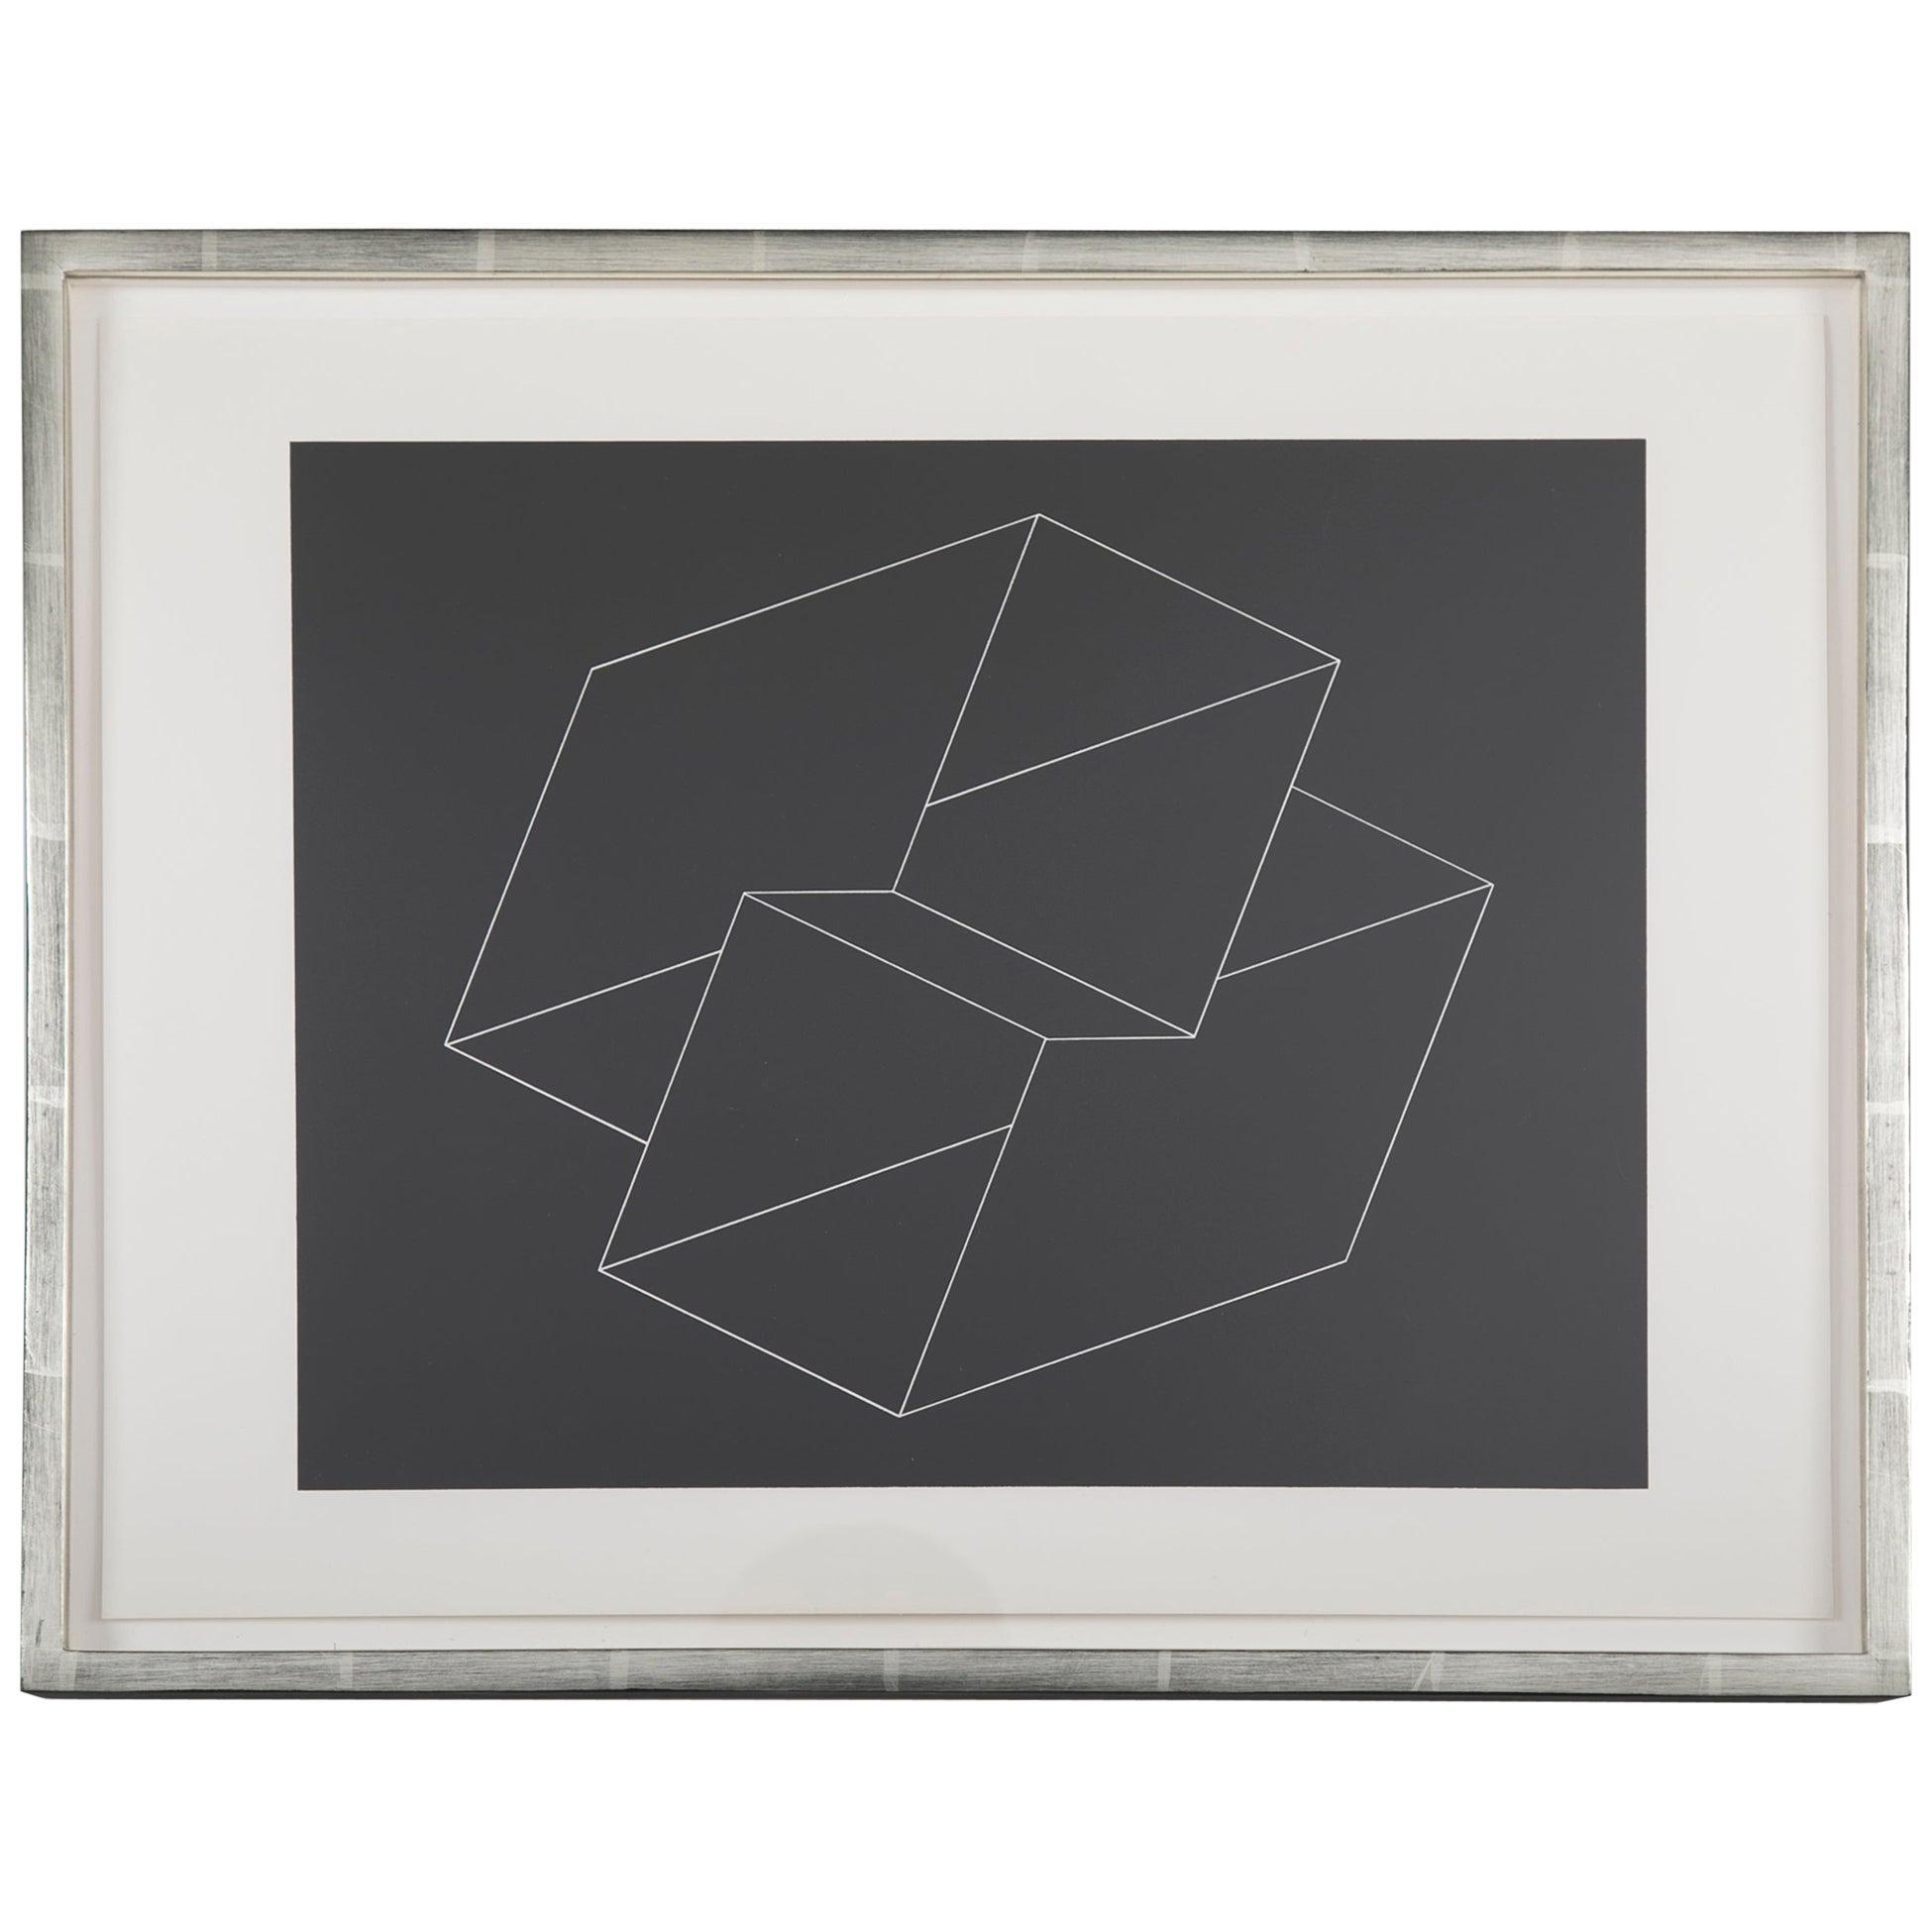 Josef Albers from Formulation, Articulation